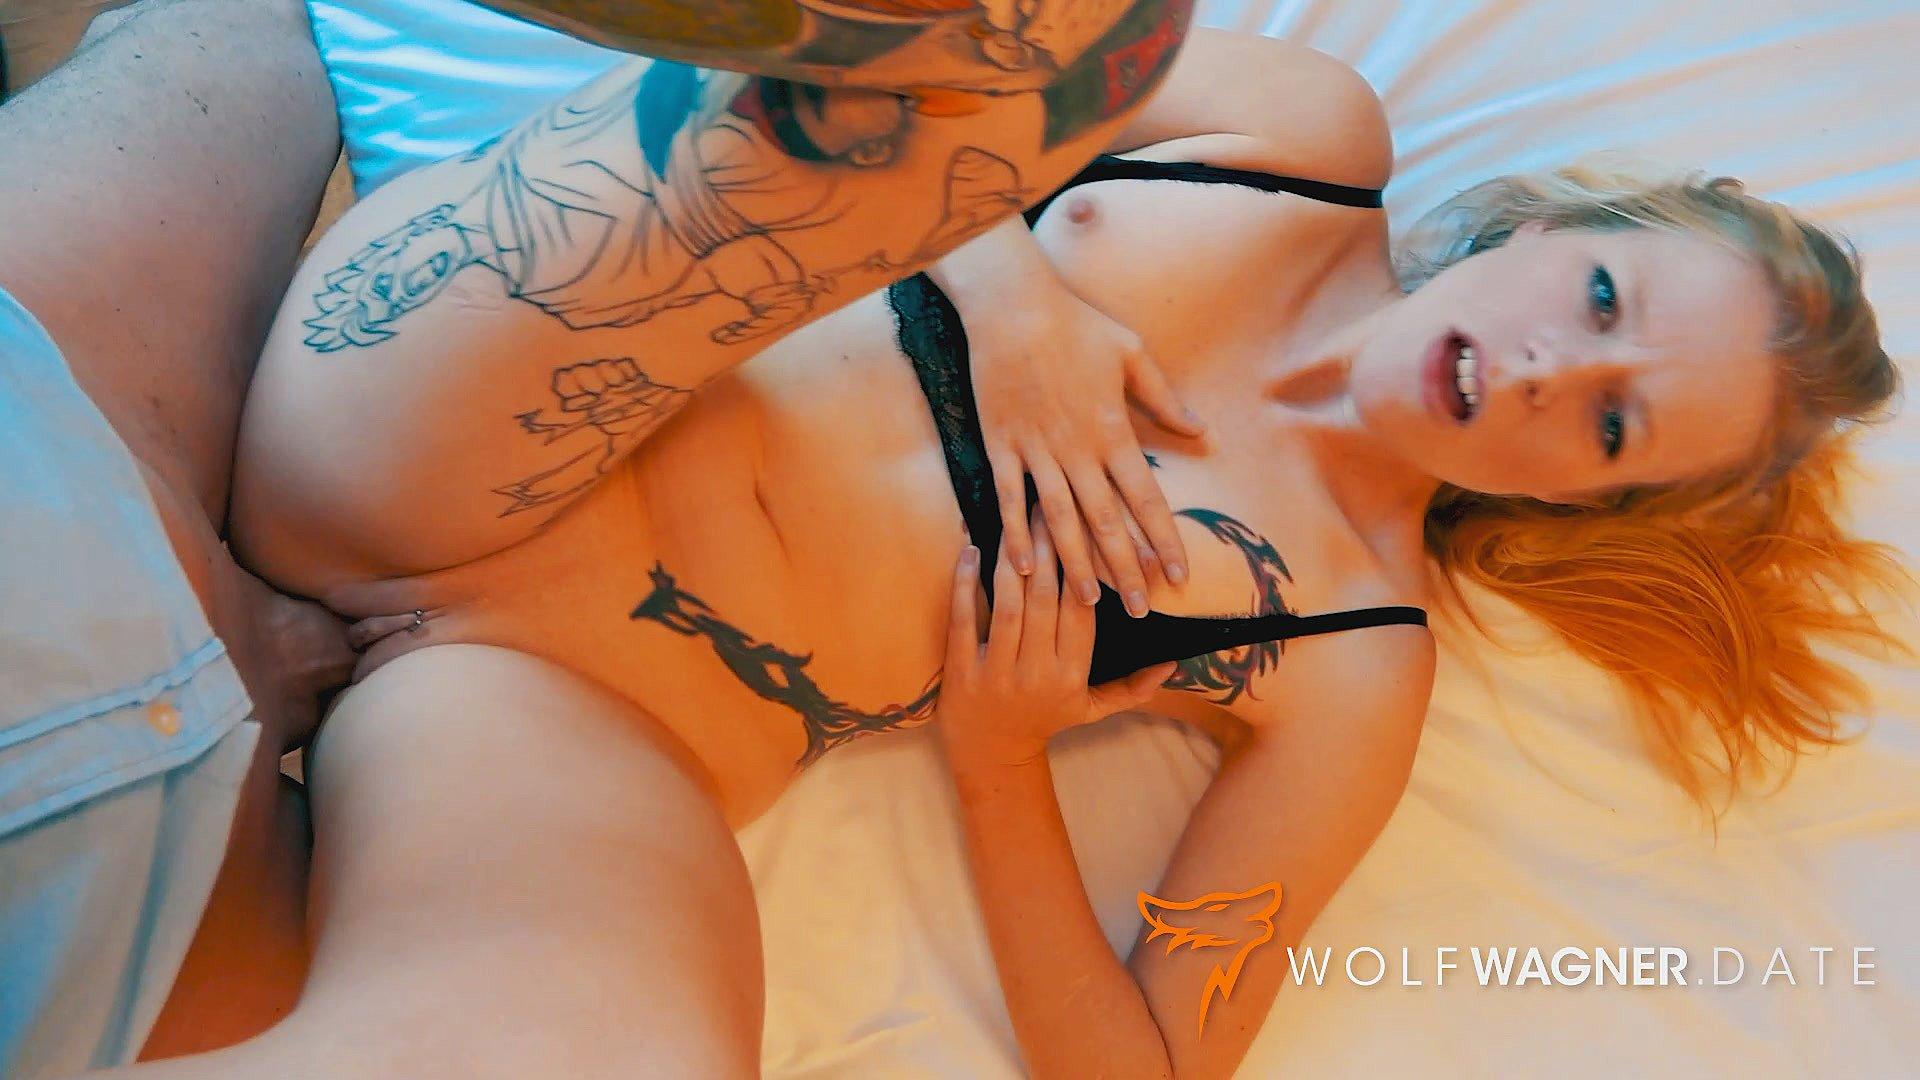 Hot German MILF Harleen Van Hynten lets modern-day Tarzan cum on her big fake tits&excl